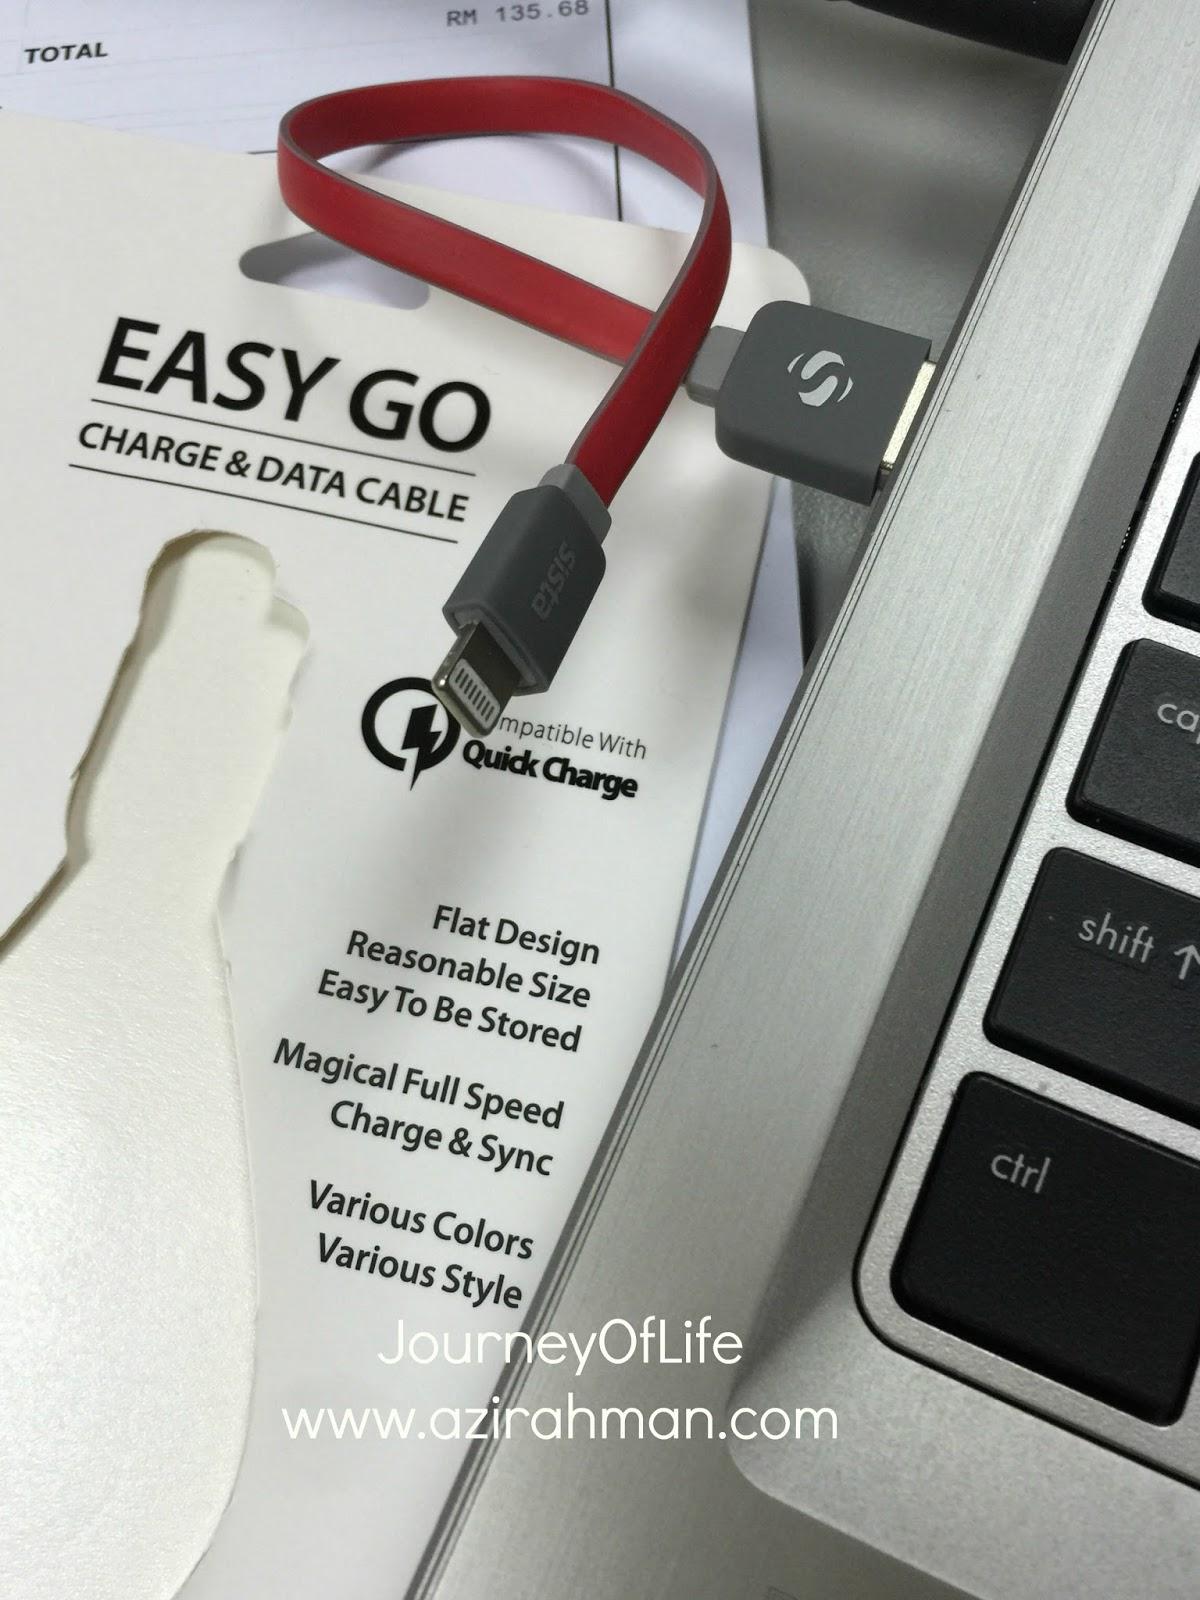 sista malaysia ; aksesori handphone ; aksesori handphone murah ; charger handphone berkualiti